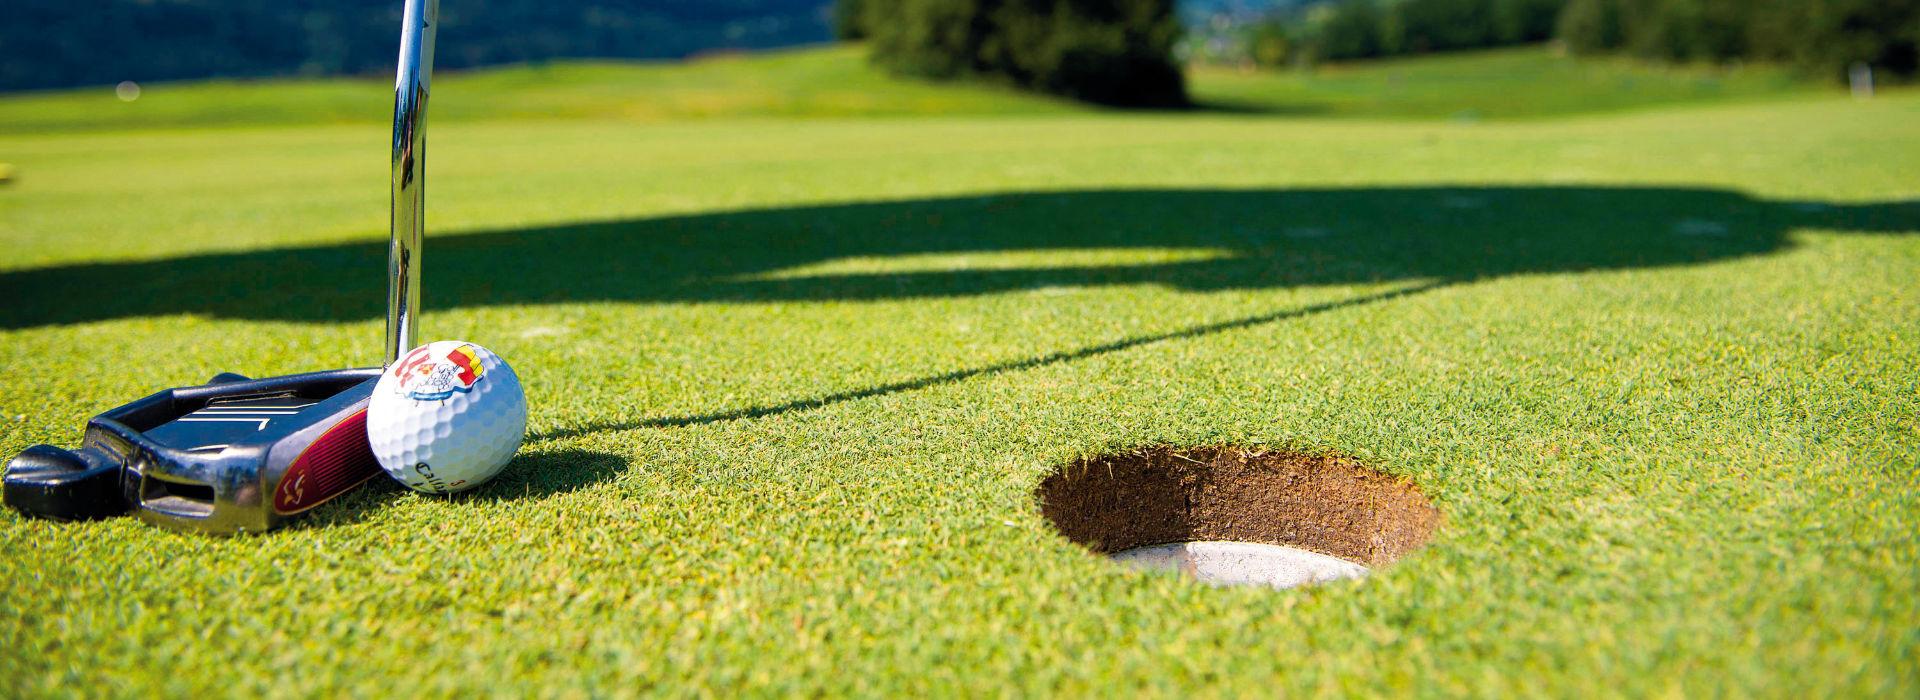 golfclub-goldegg-platz-spiel